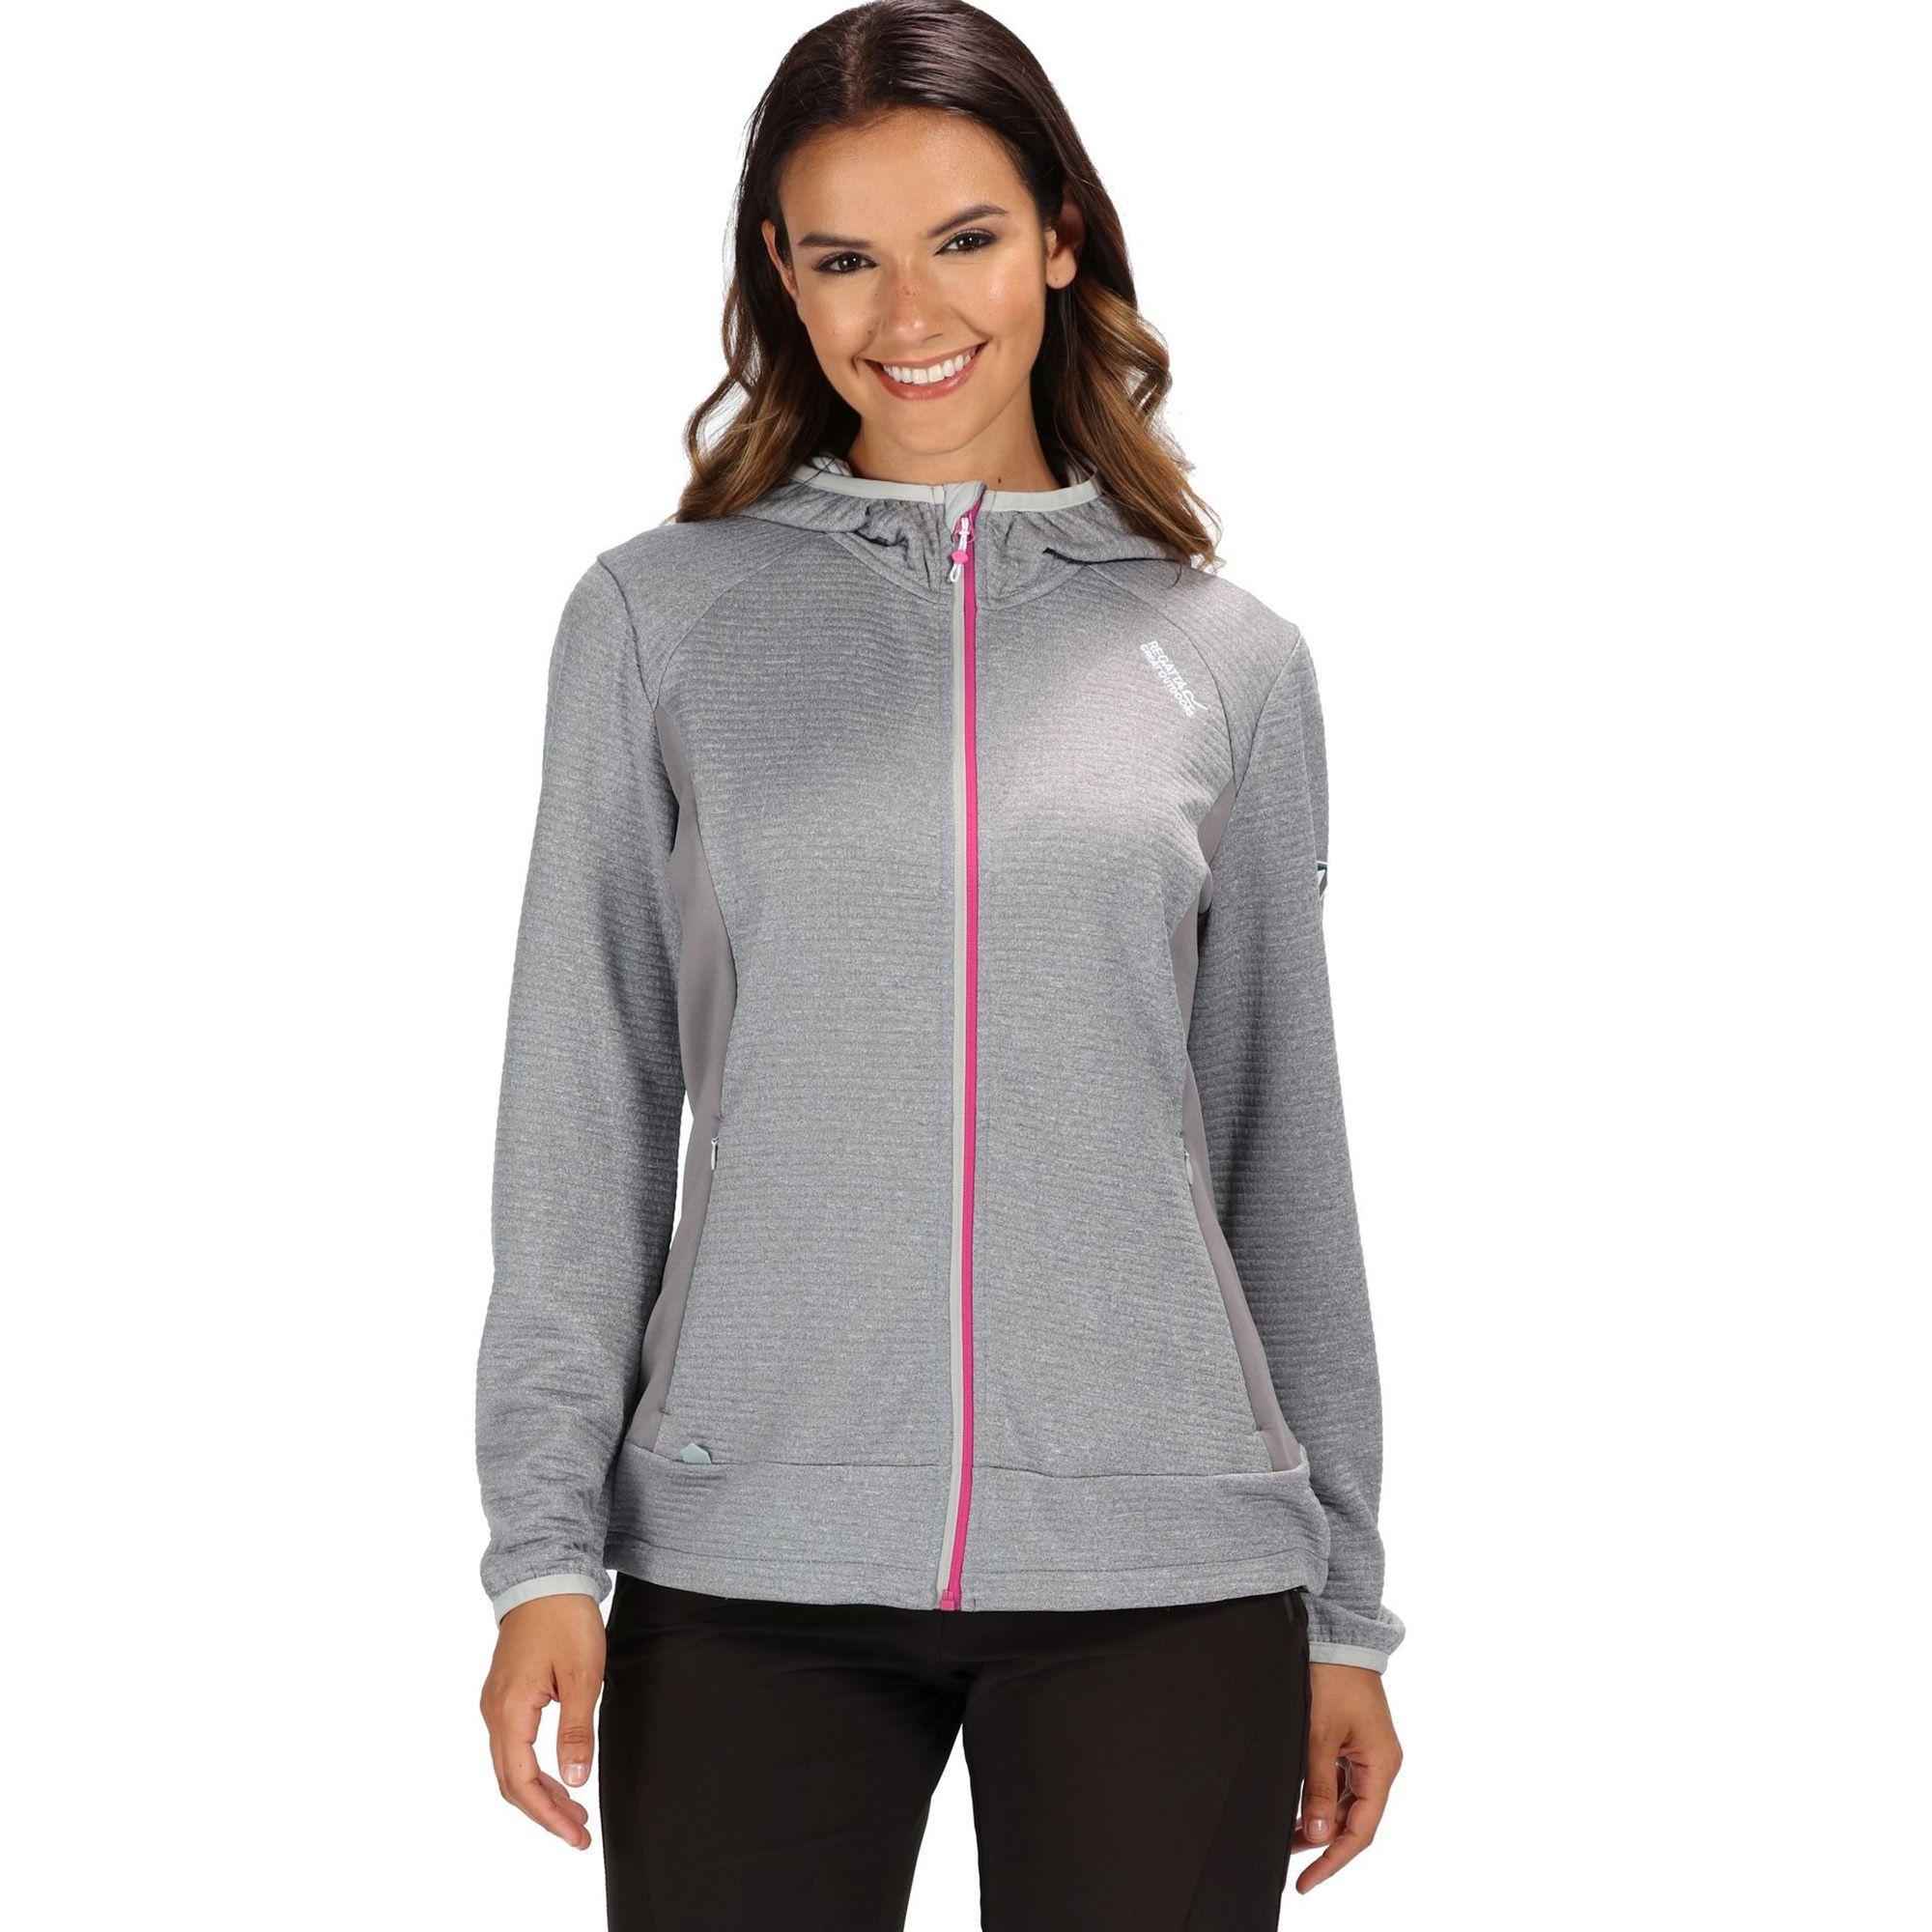 2 x Regatta Ramosa Womens Full Zip Fleece Jacket Blue /& Orange